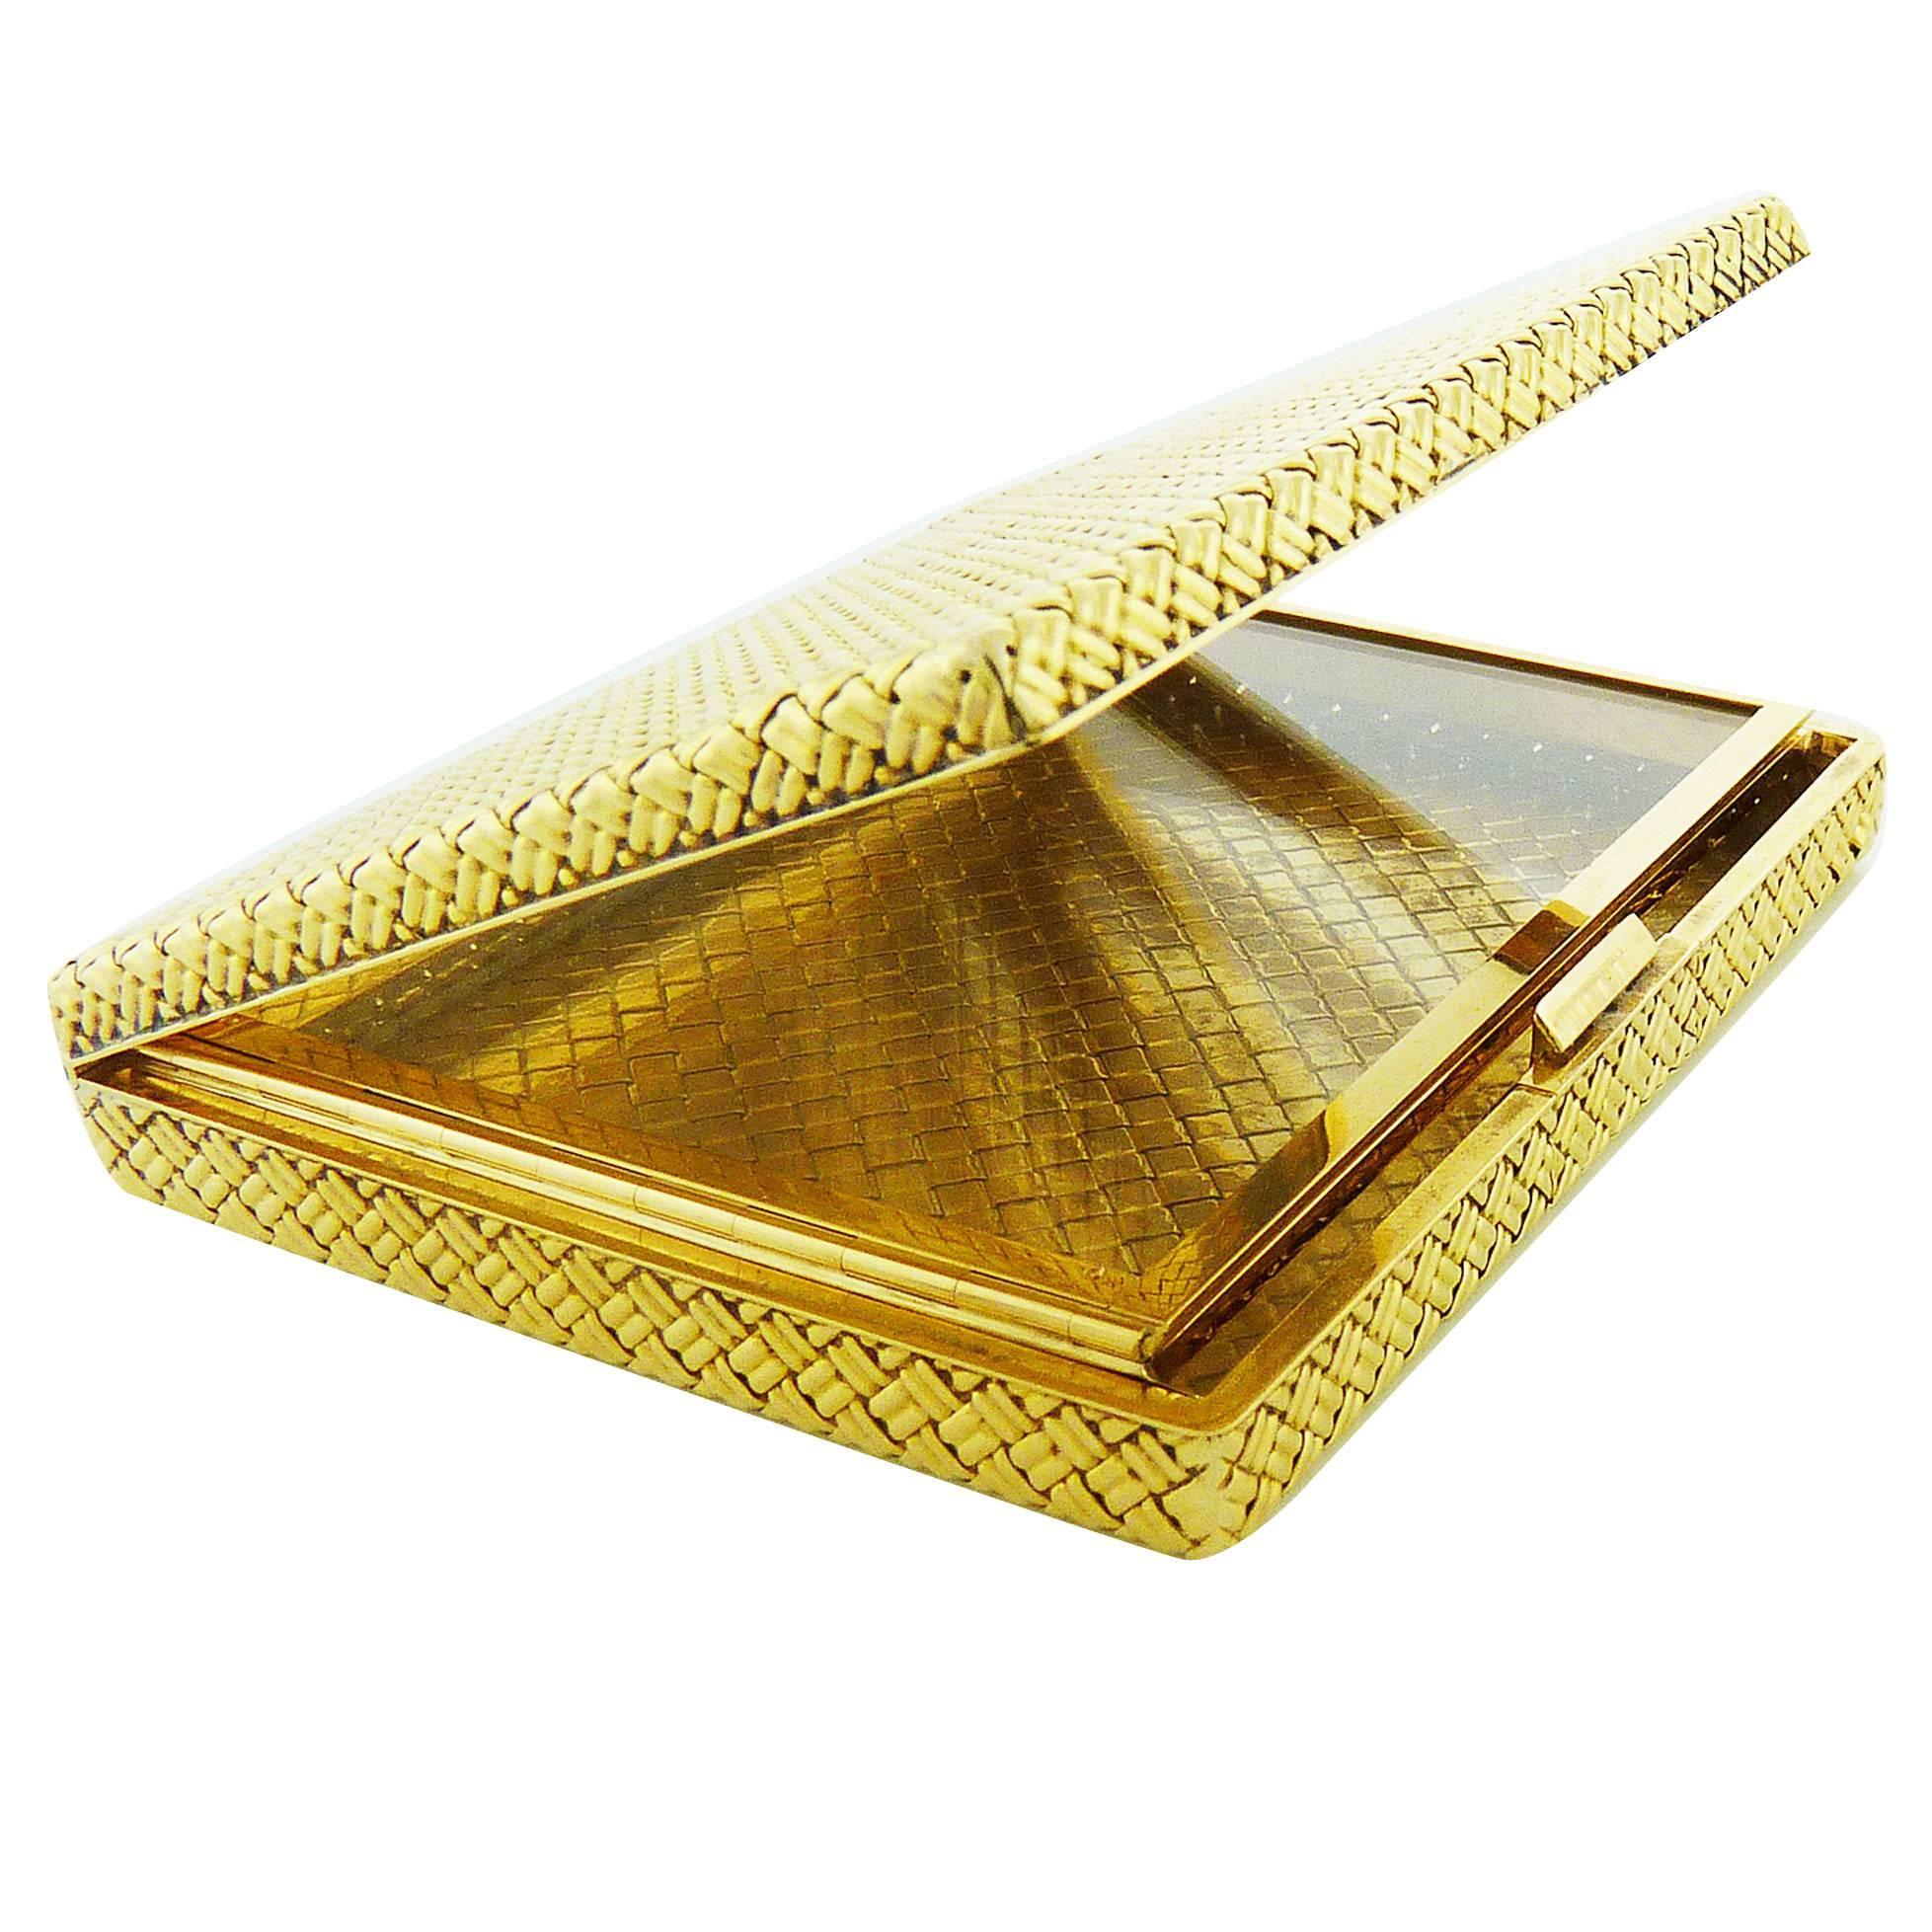 1960s Van Cleef & Arpels 18K Yellow Gold Make-Up Compact